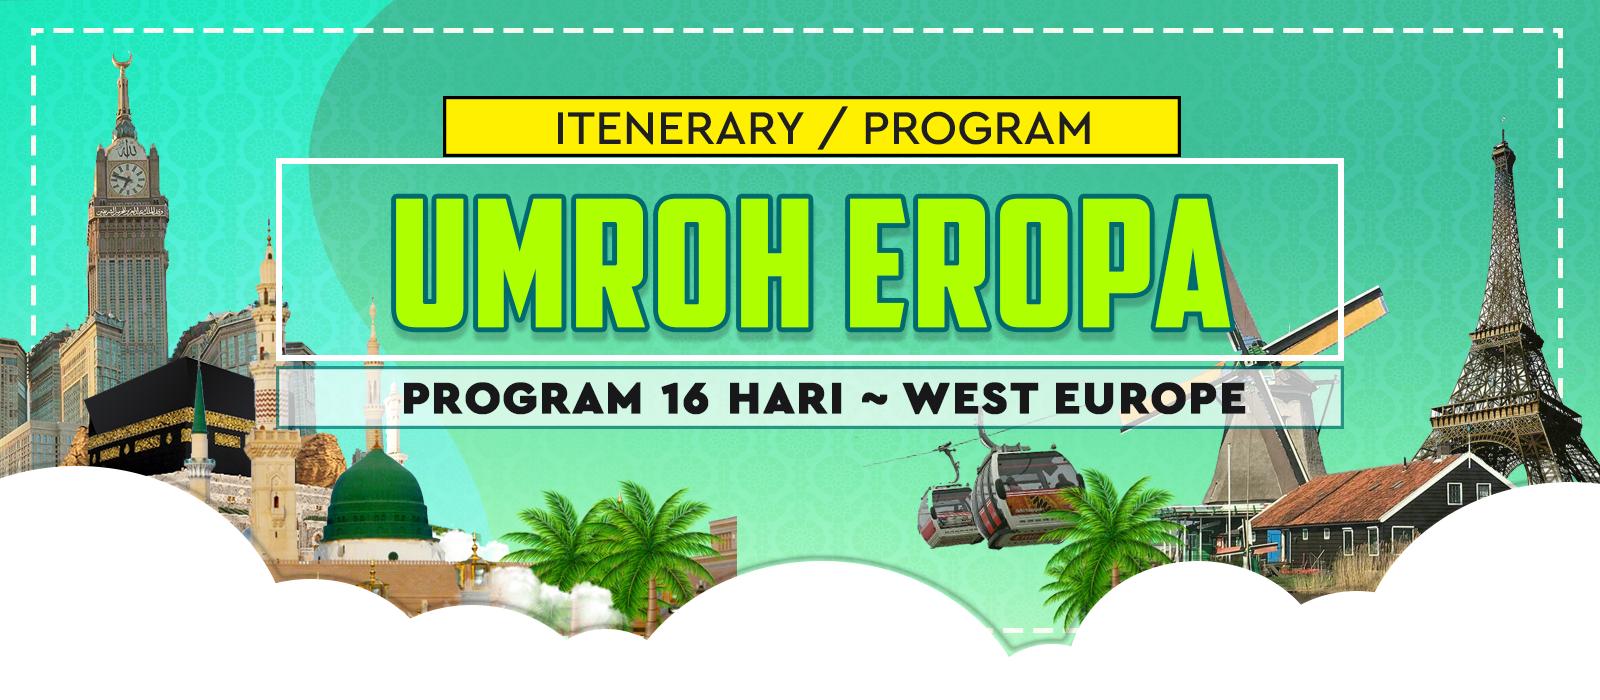 Program Itinerary Paket Umroh Plus Eropa